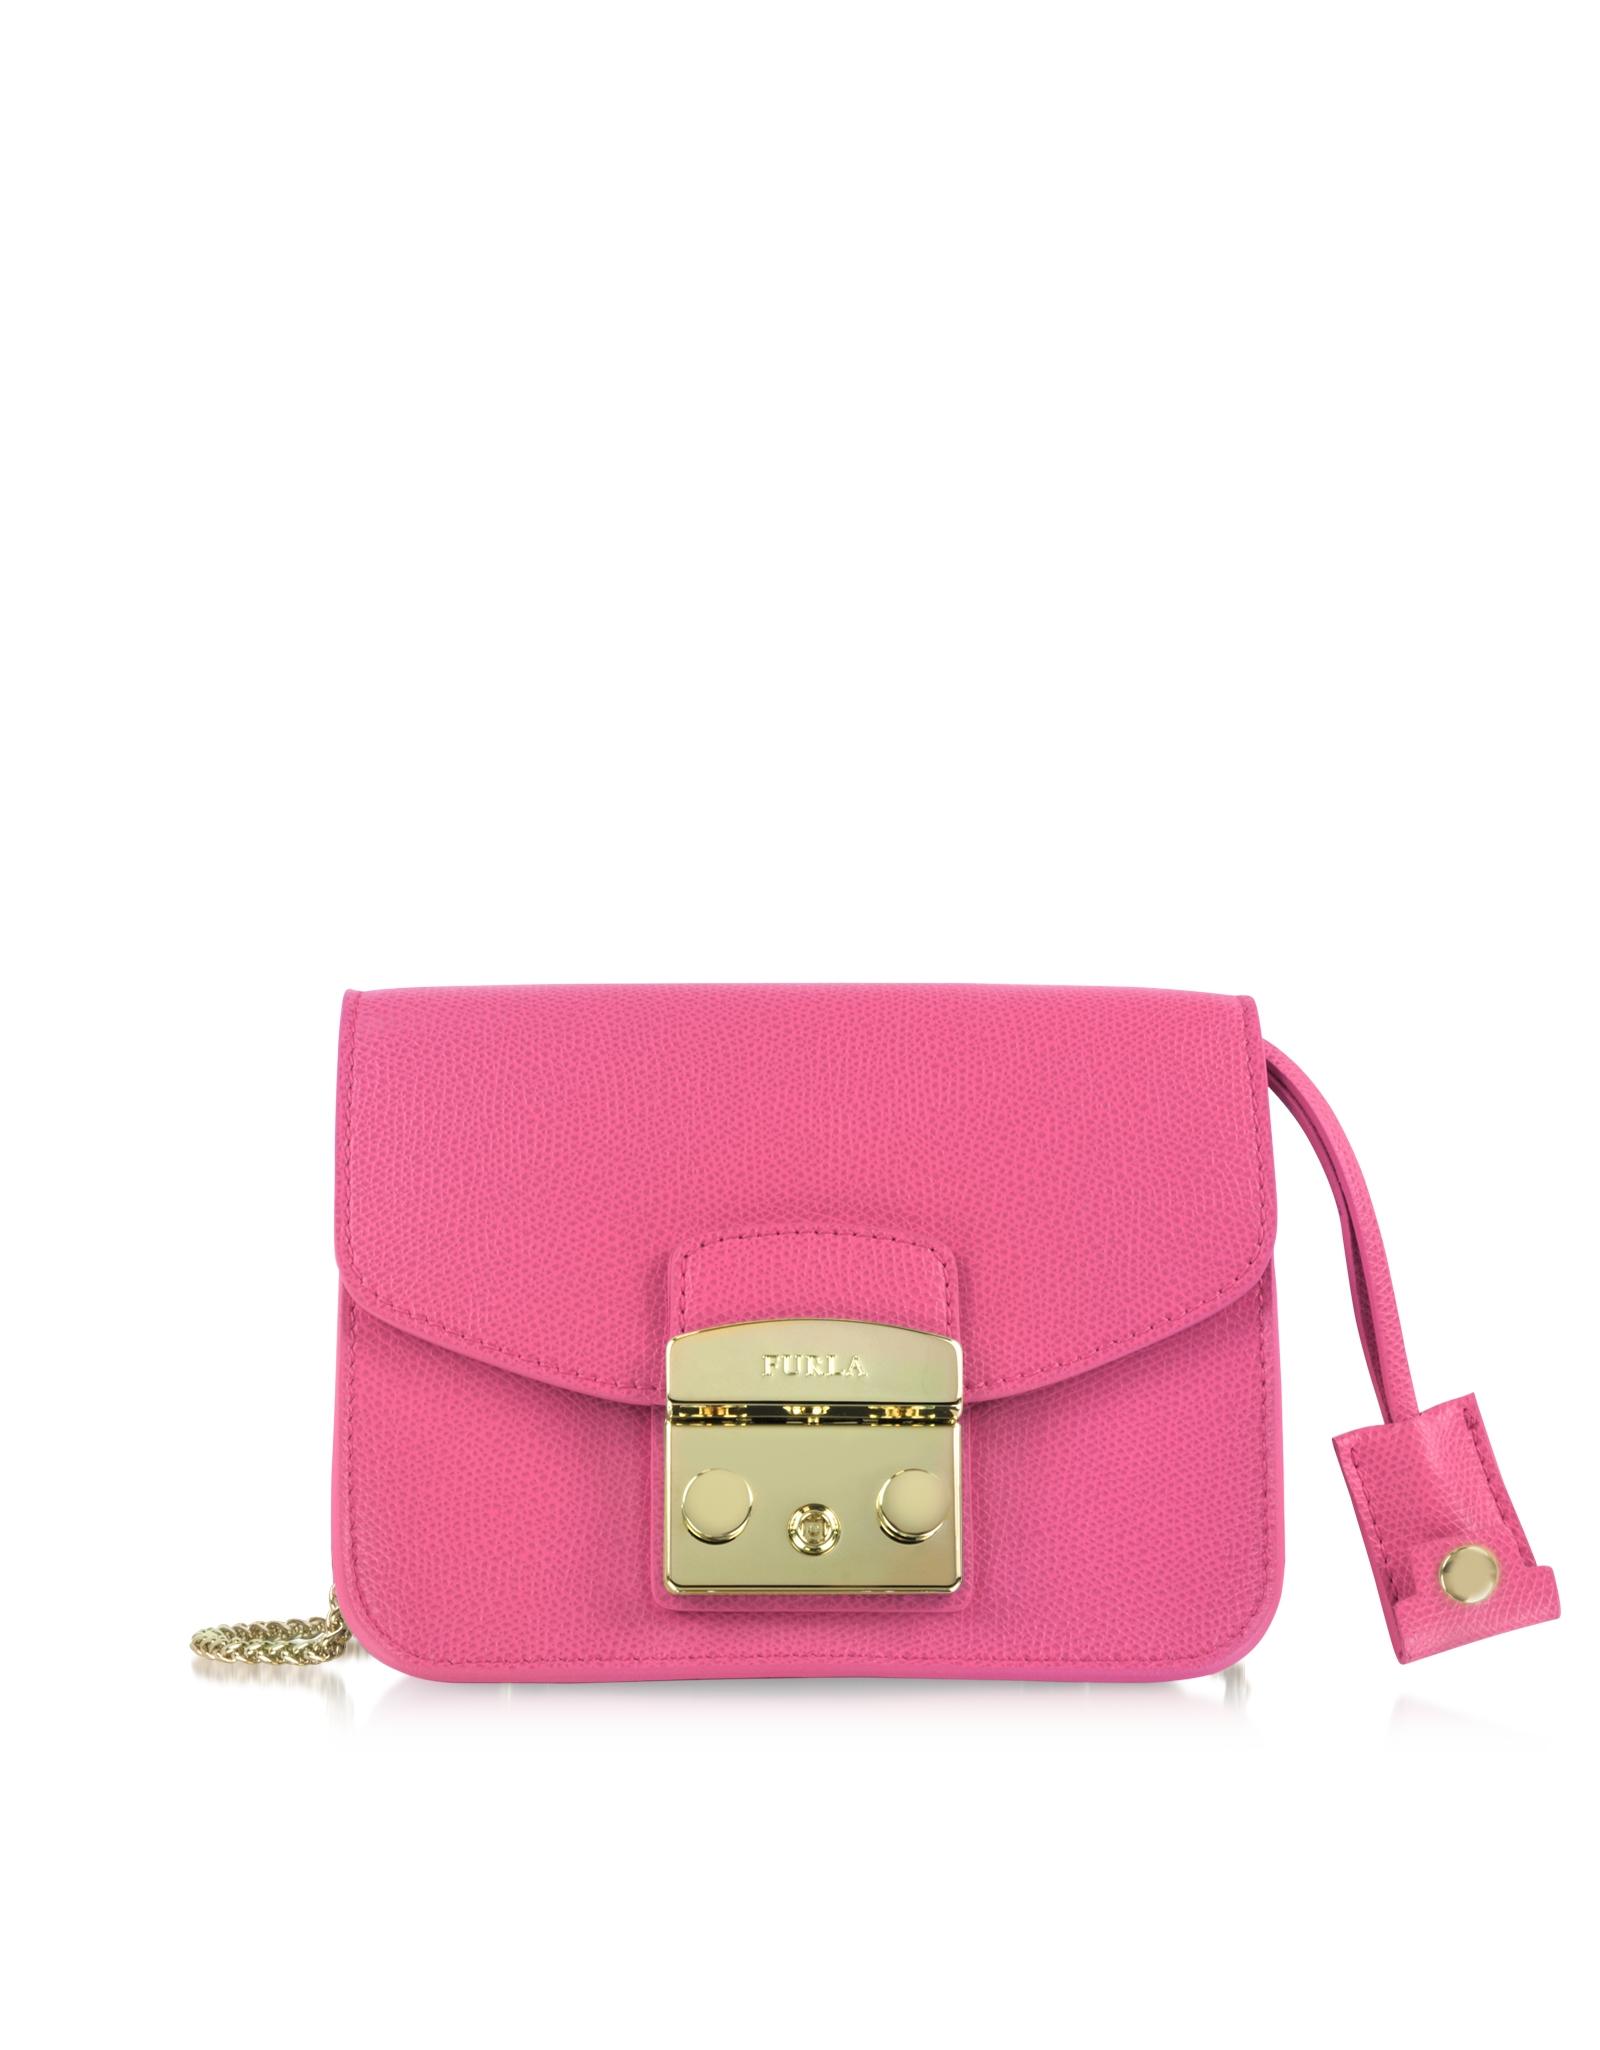 furla metropolis mini crossbody bag in pink lyst. Black Bedroom Furniture Sets. Home Design Ideas